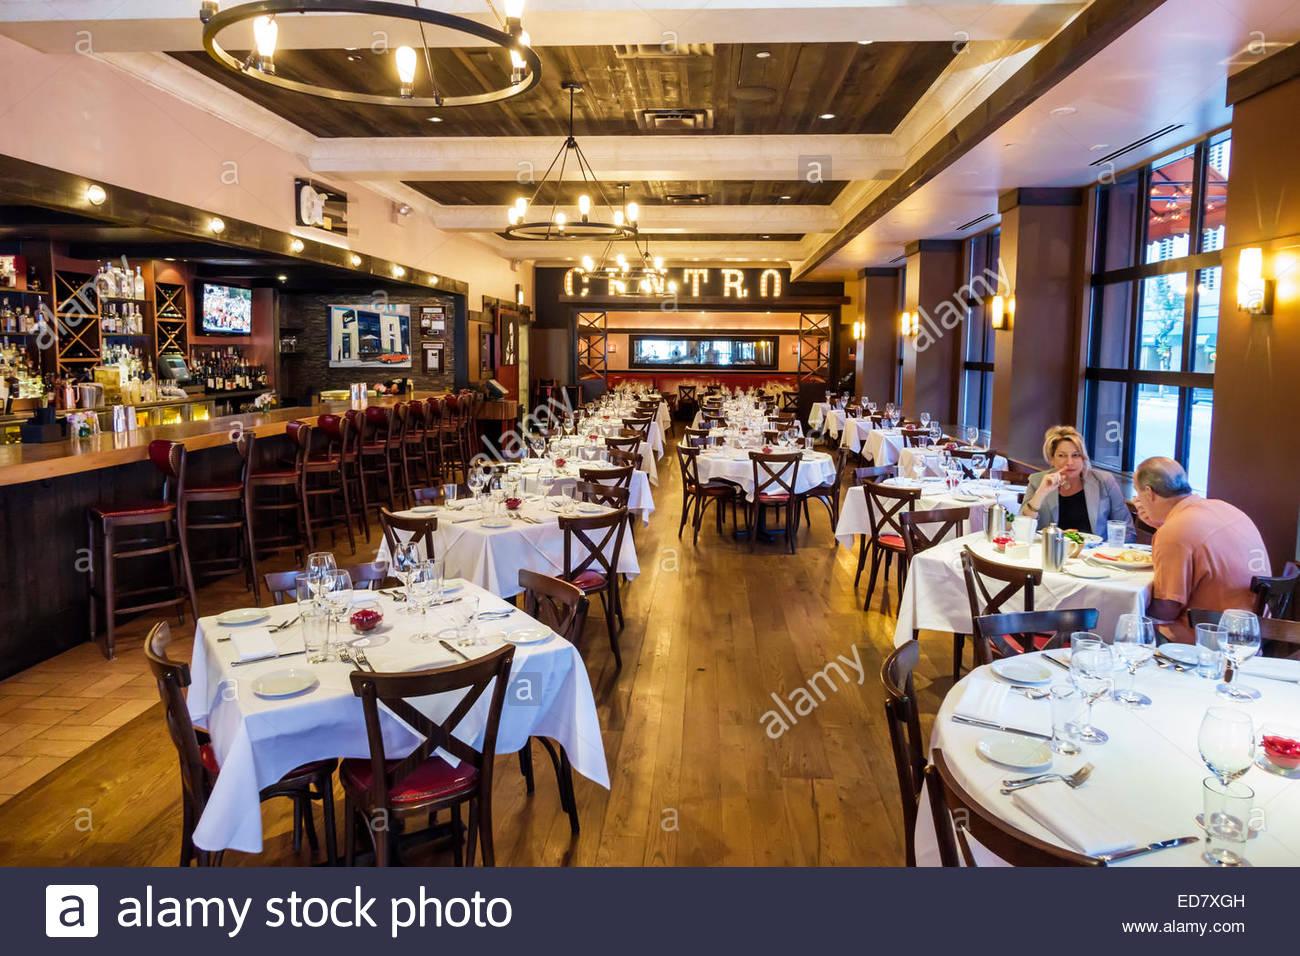 River North de Chicago, Illinois, Centro Ristorante Italiano Restaurante interior vacío interior hombre mujer Imagen De Stock